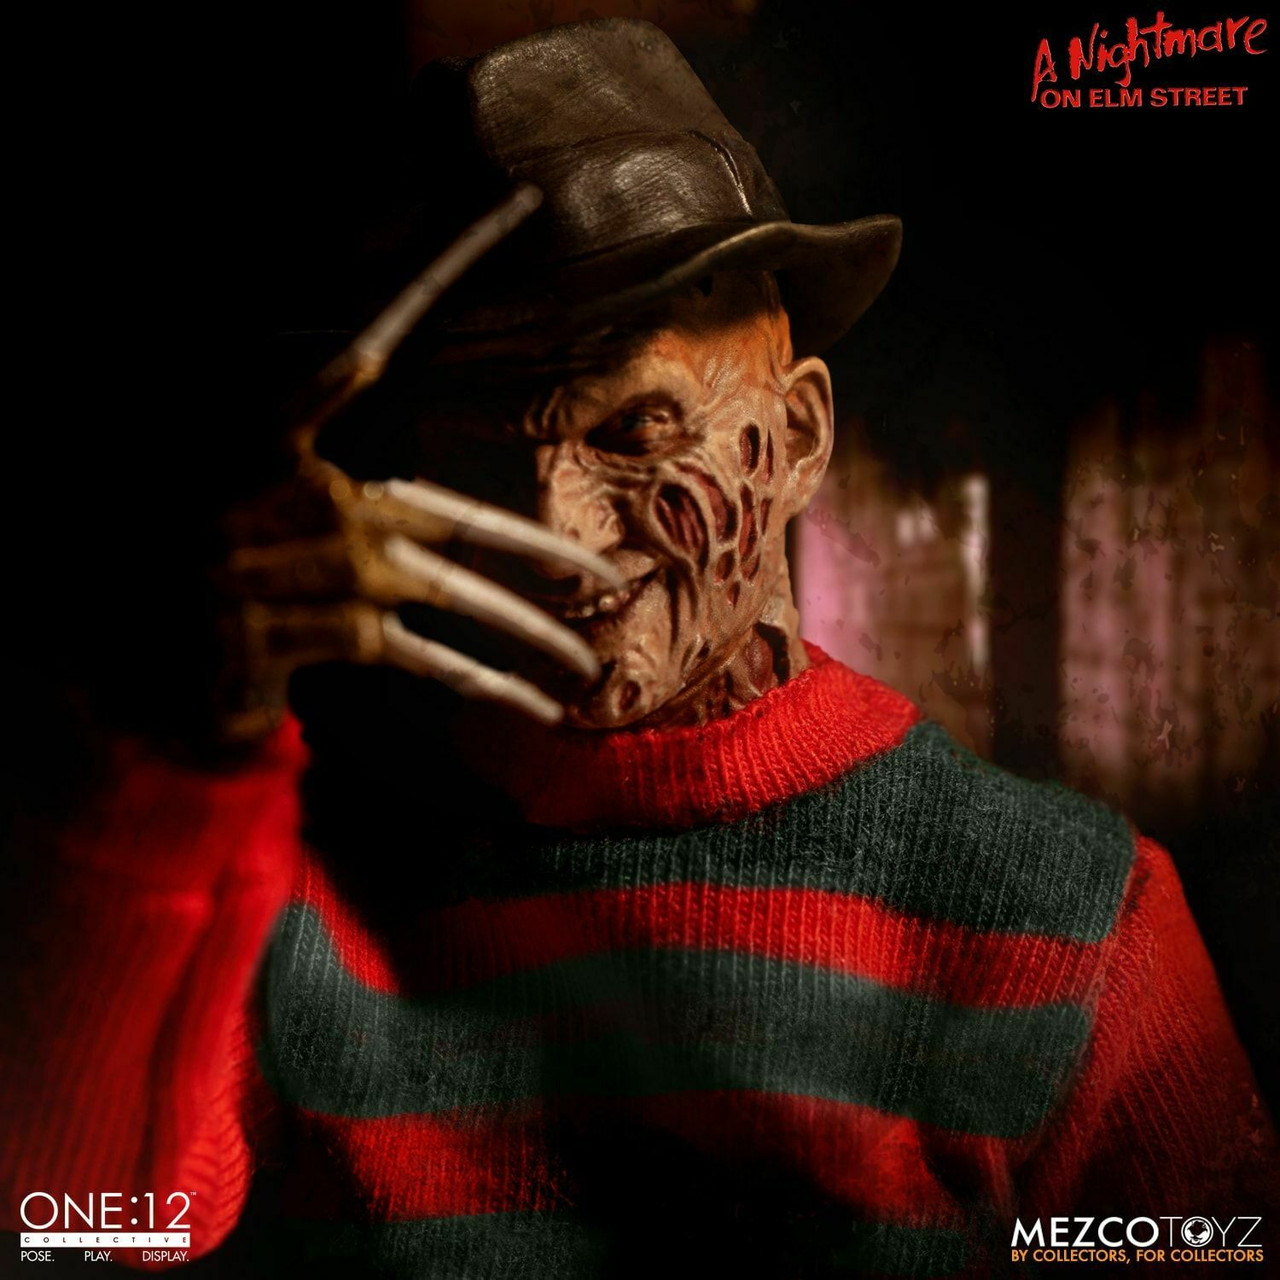 Mezco Toyz A Nightmare on Elm Street Freddy Krueger One:12 Horreur Figure 77390